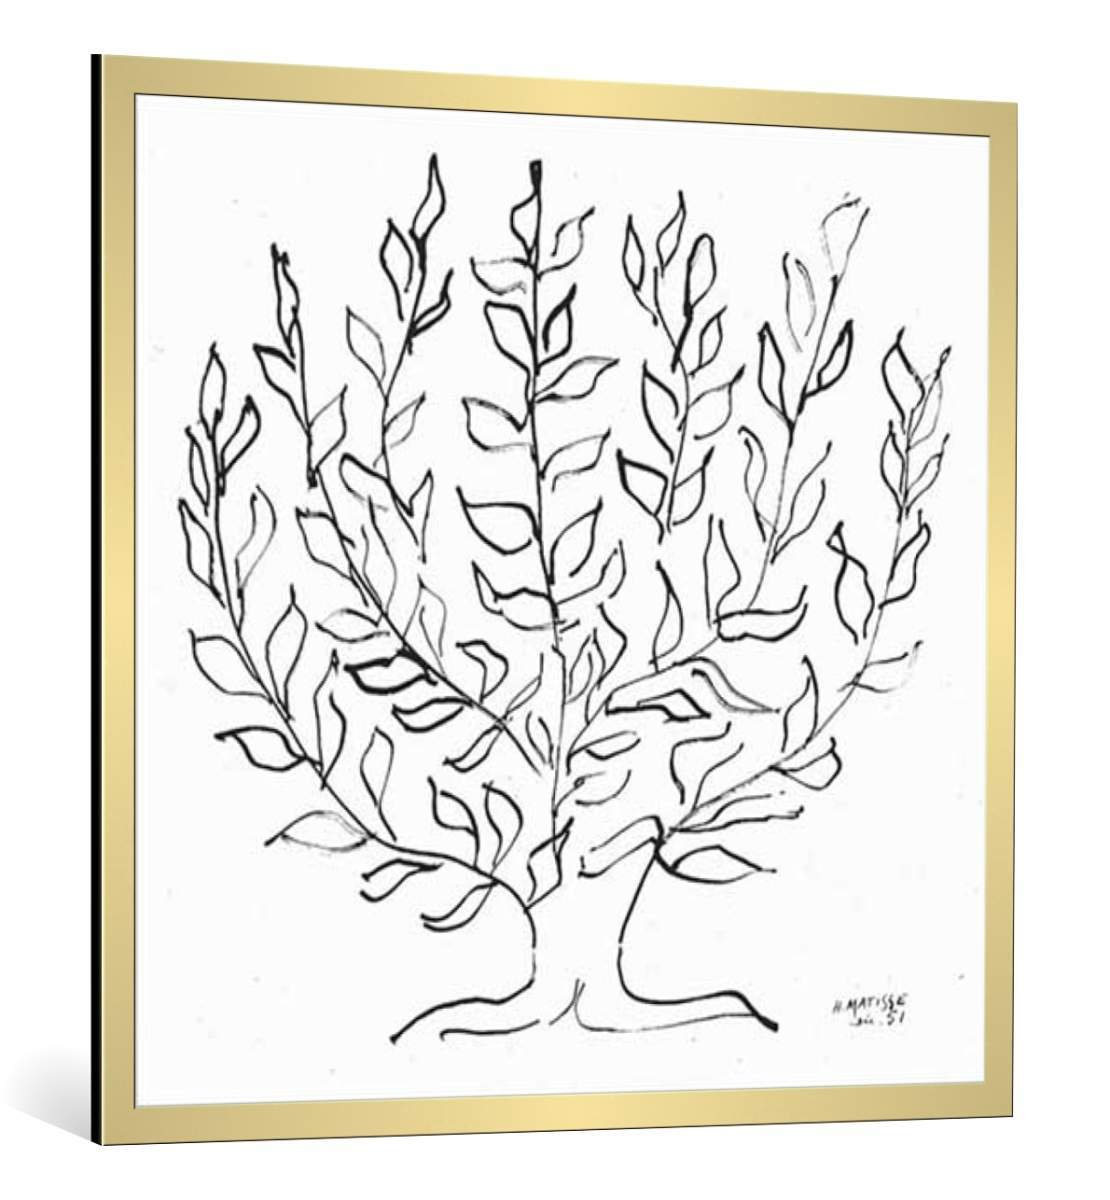 Kunstdruck  Poster  Kunstdruck Henri Matisse Le platane 1951